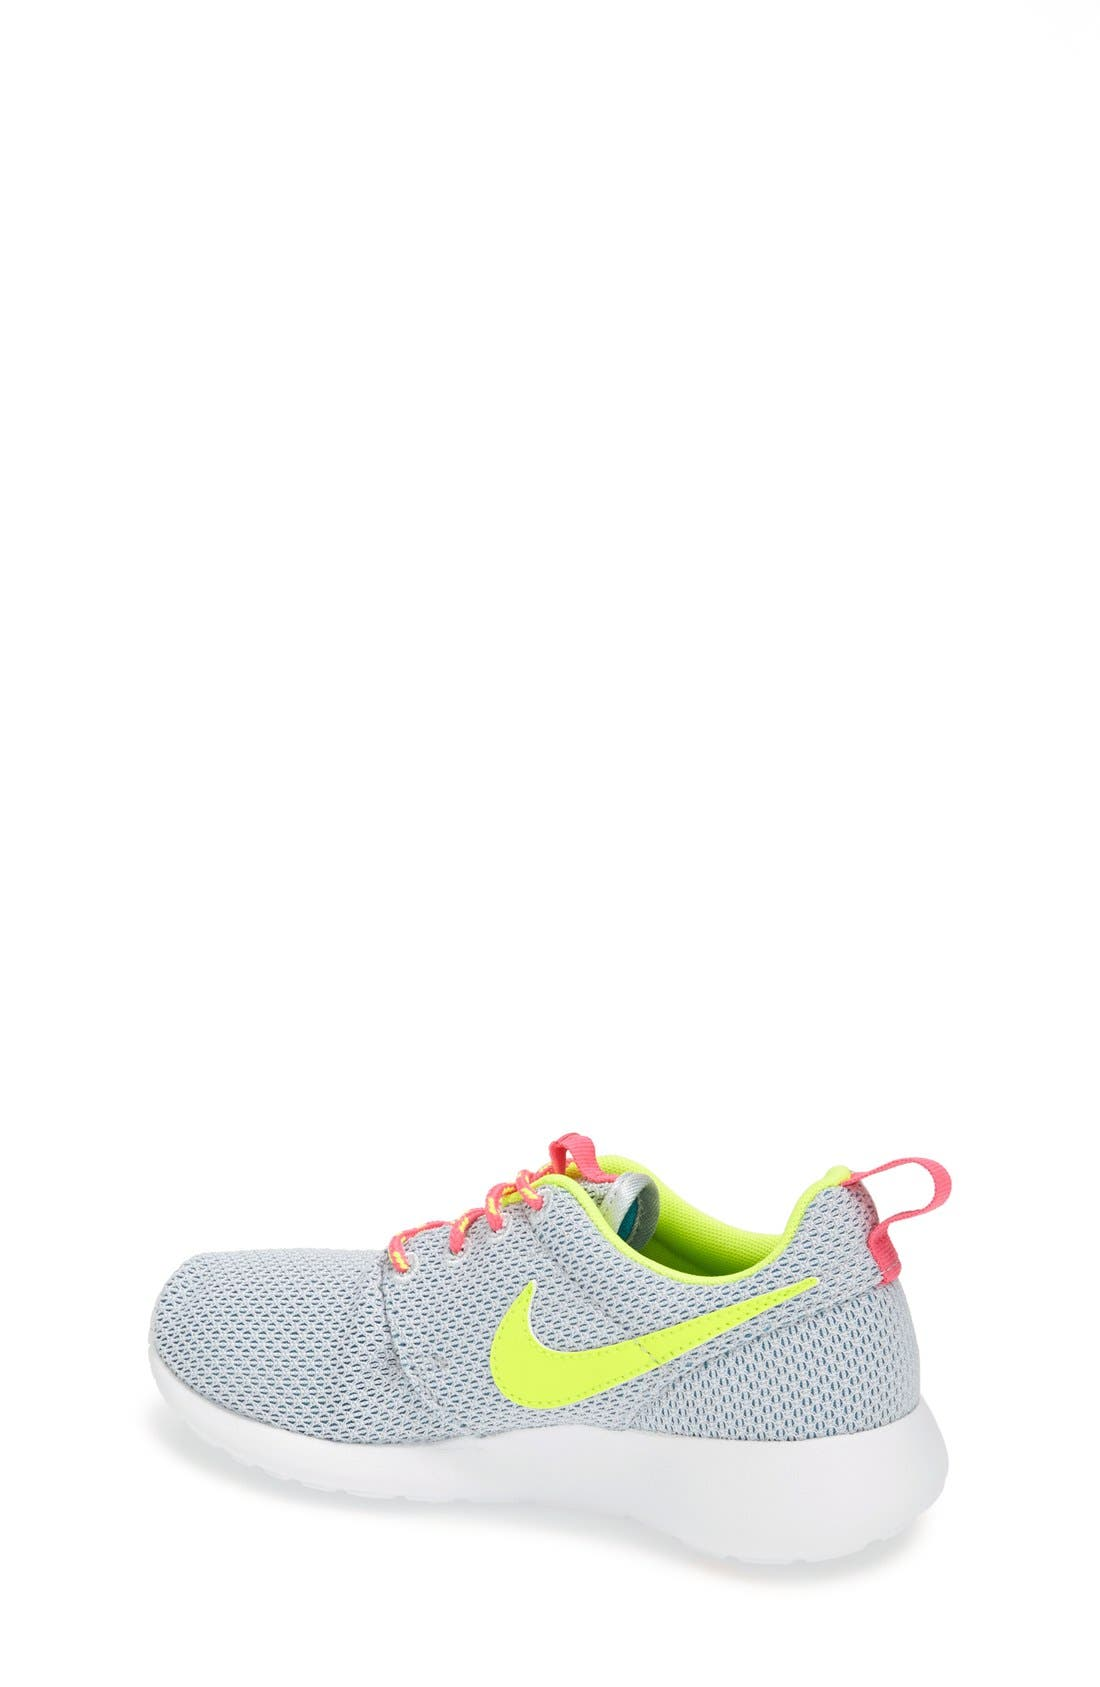 'Roshe Run' Athletic Shoe,                             Alternate thumbnail 159, color,